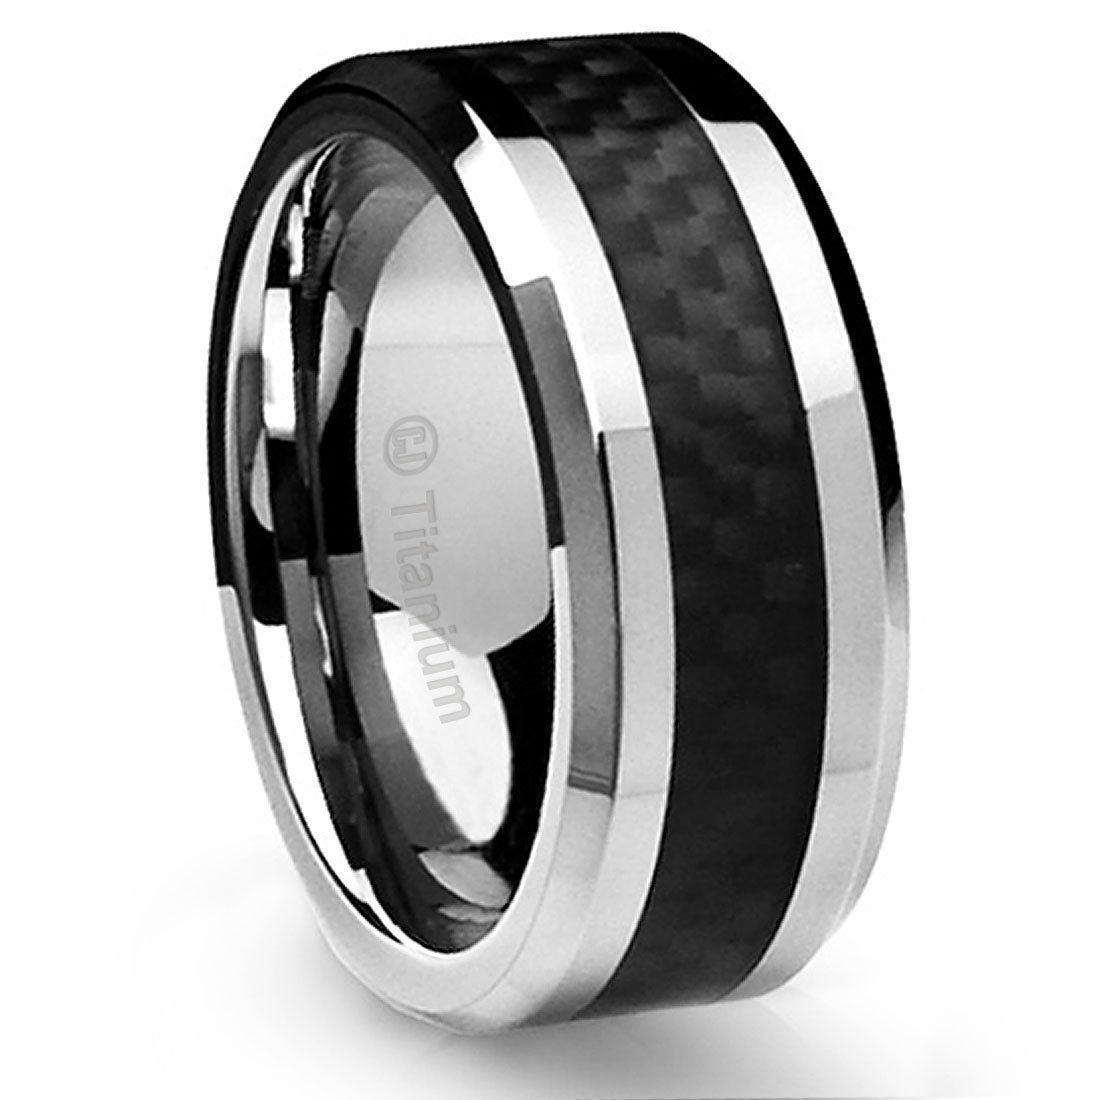 10mm wide mens wedding bands